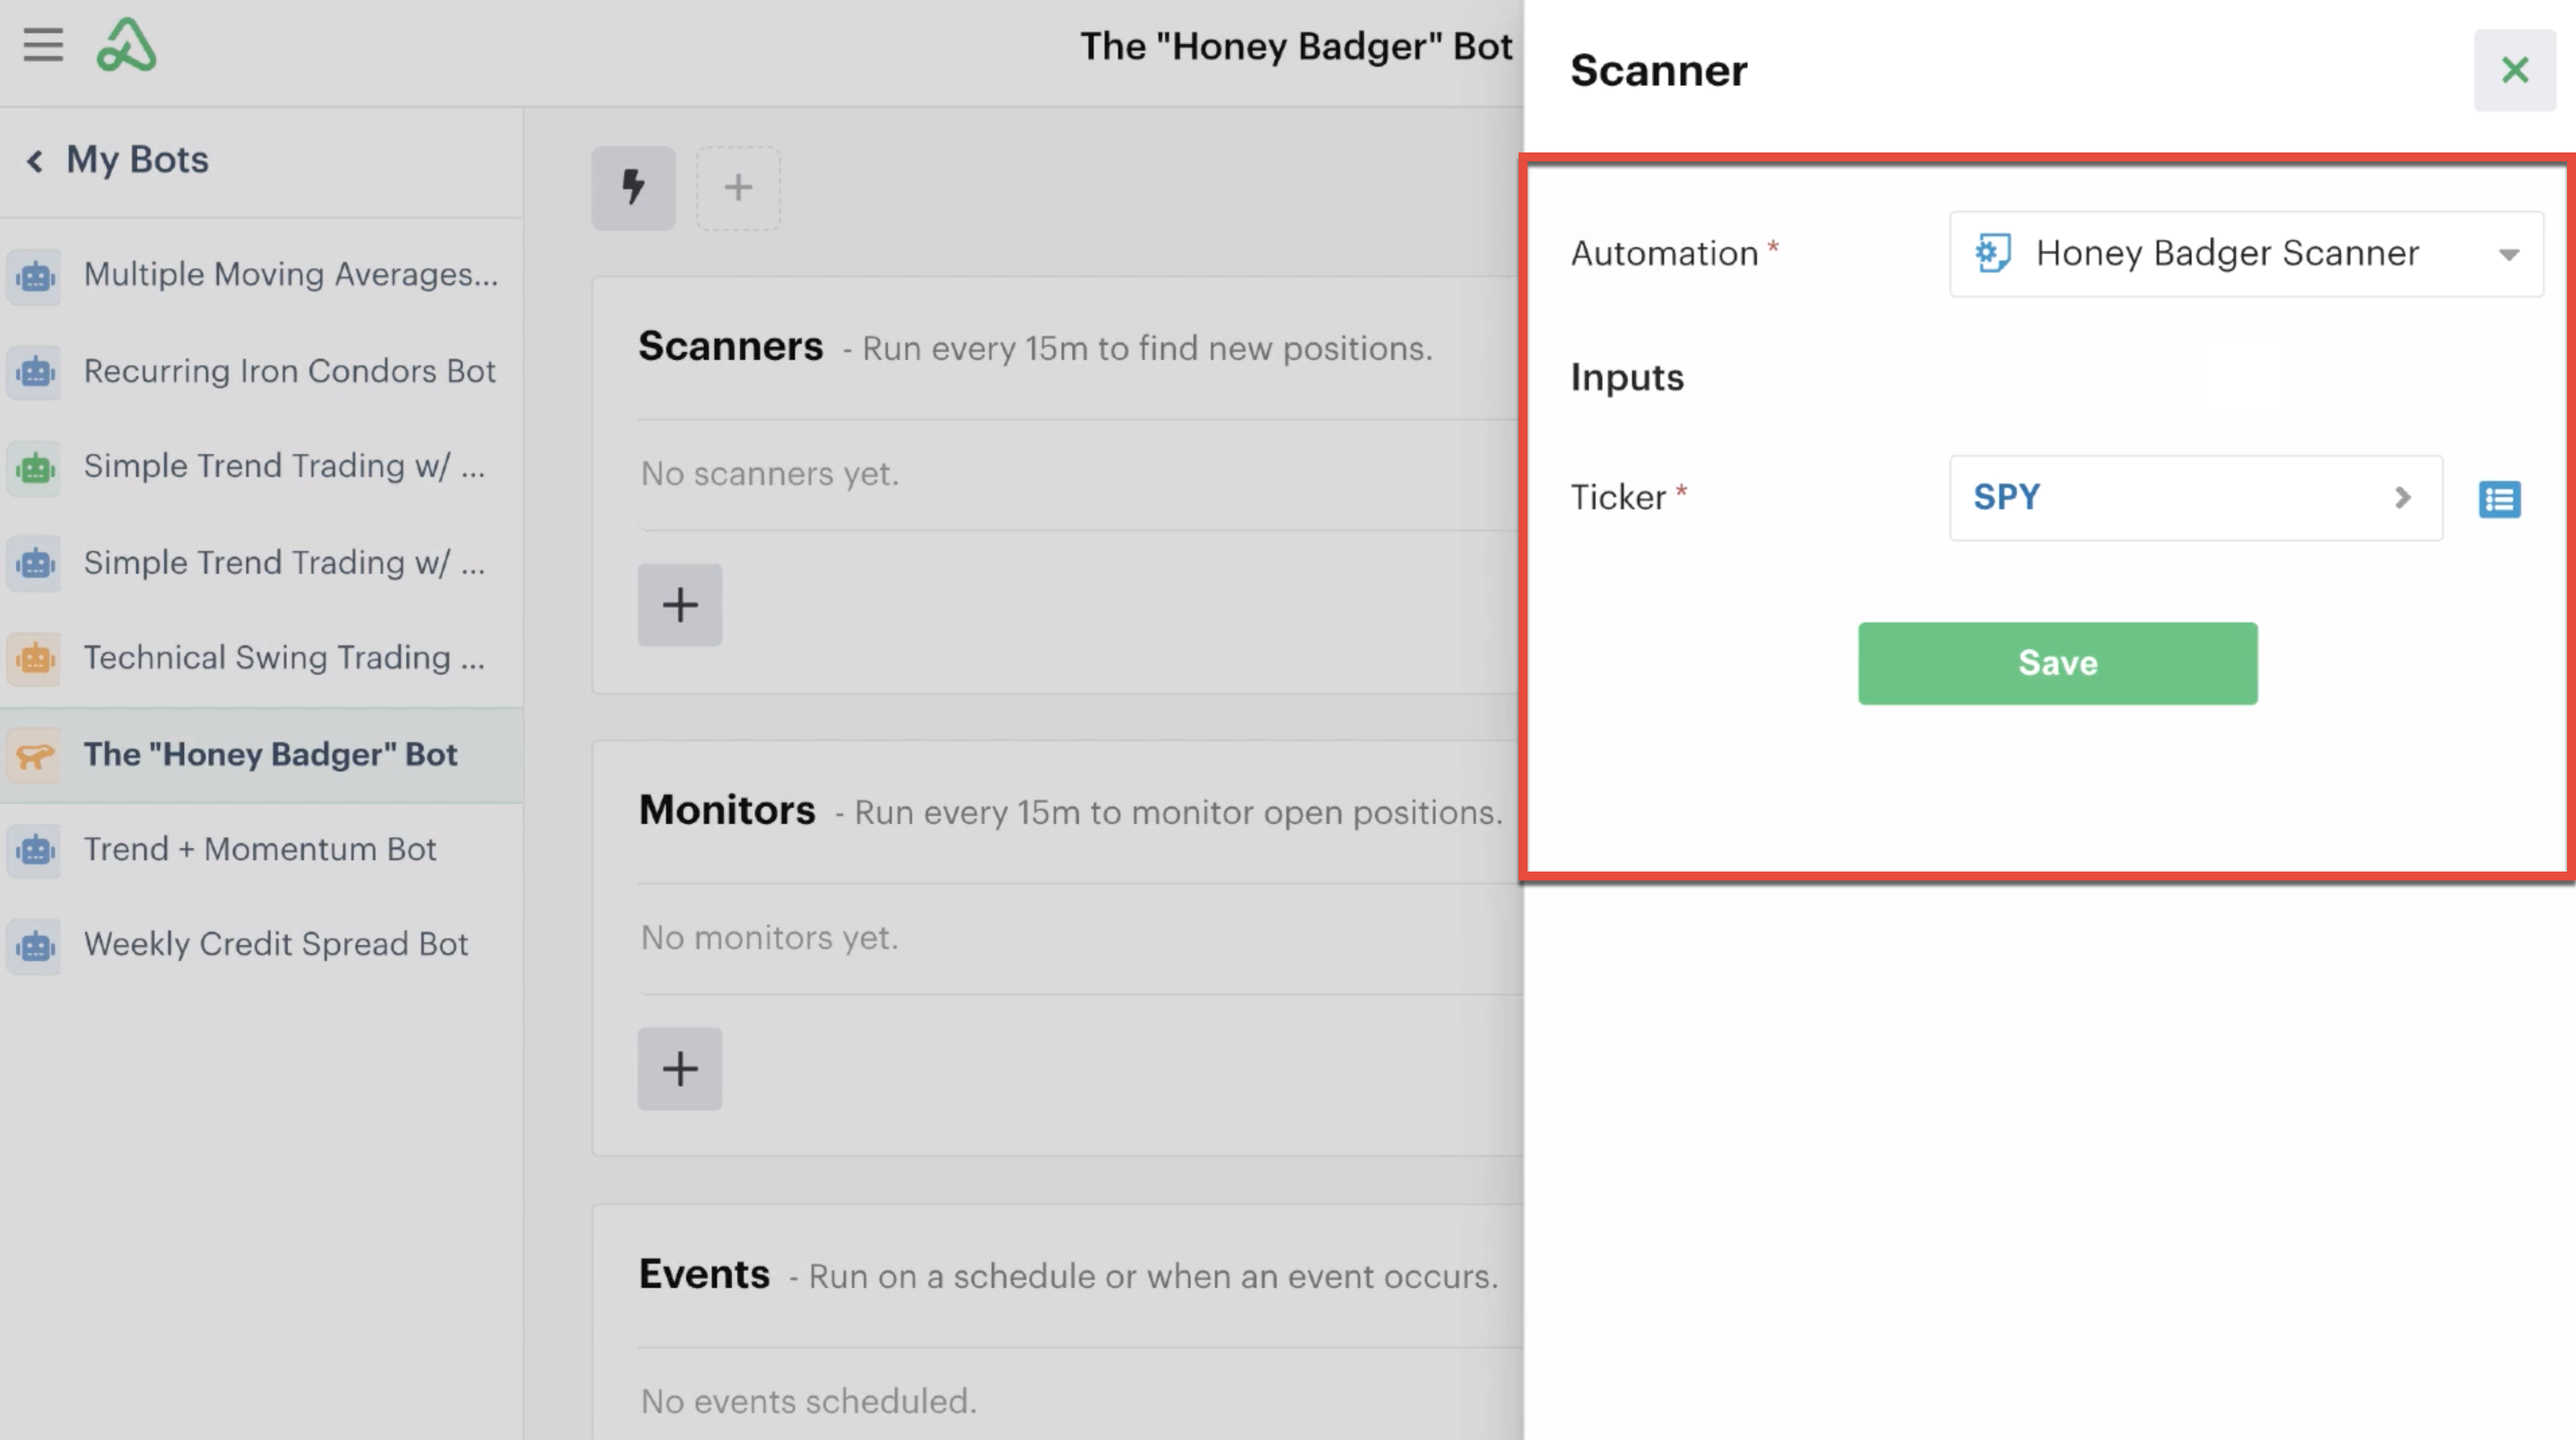 Scanner automation details